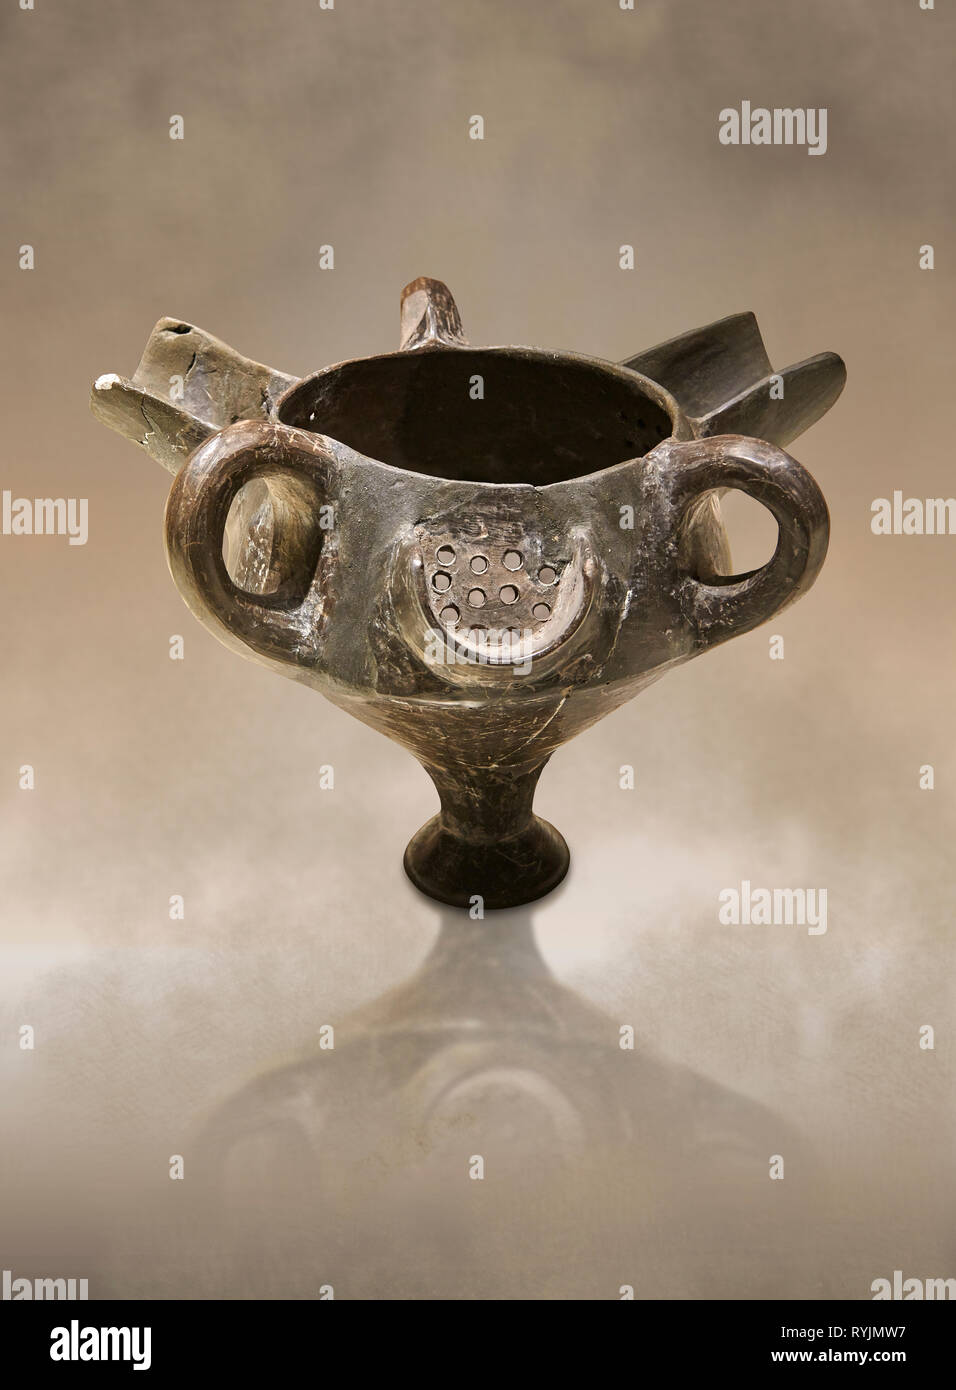 Bronze Age Anatolian terra cotta vessel with strainer - 19th to 17th century BC - Kültepe Kanesh - Museum of Anatolian Civilisations, Ankara, Turkey.  - Stock Image